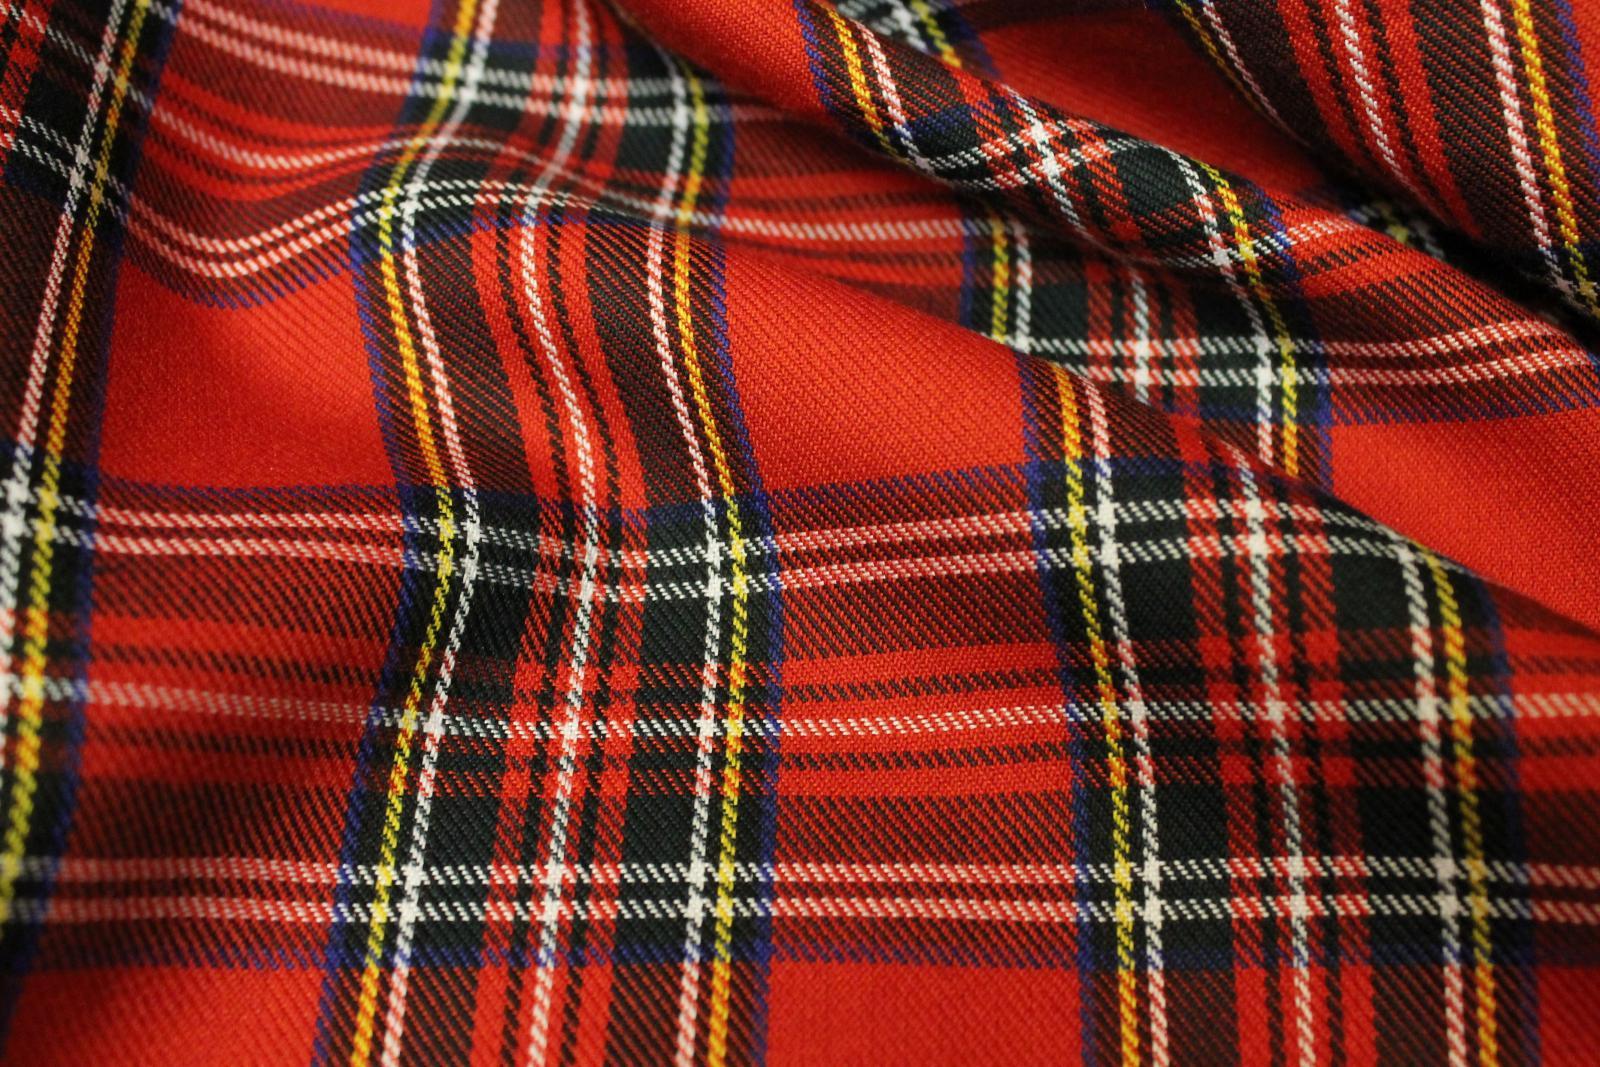 Genuine Red Royal Stewart Tartan Woven Poly-Viscose Craft